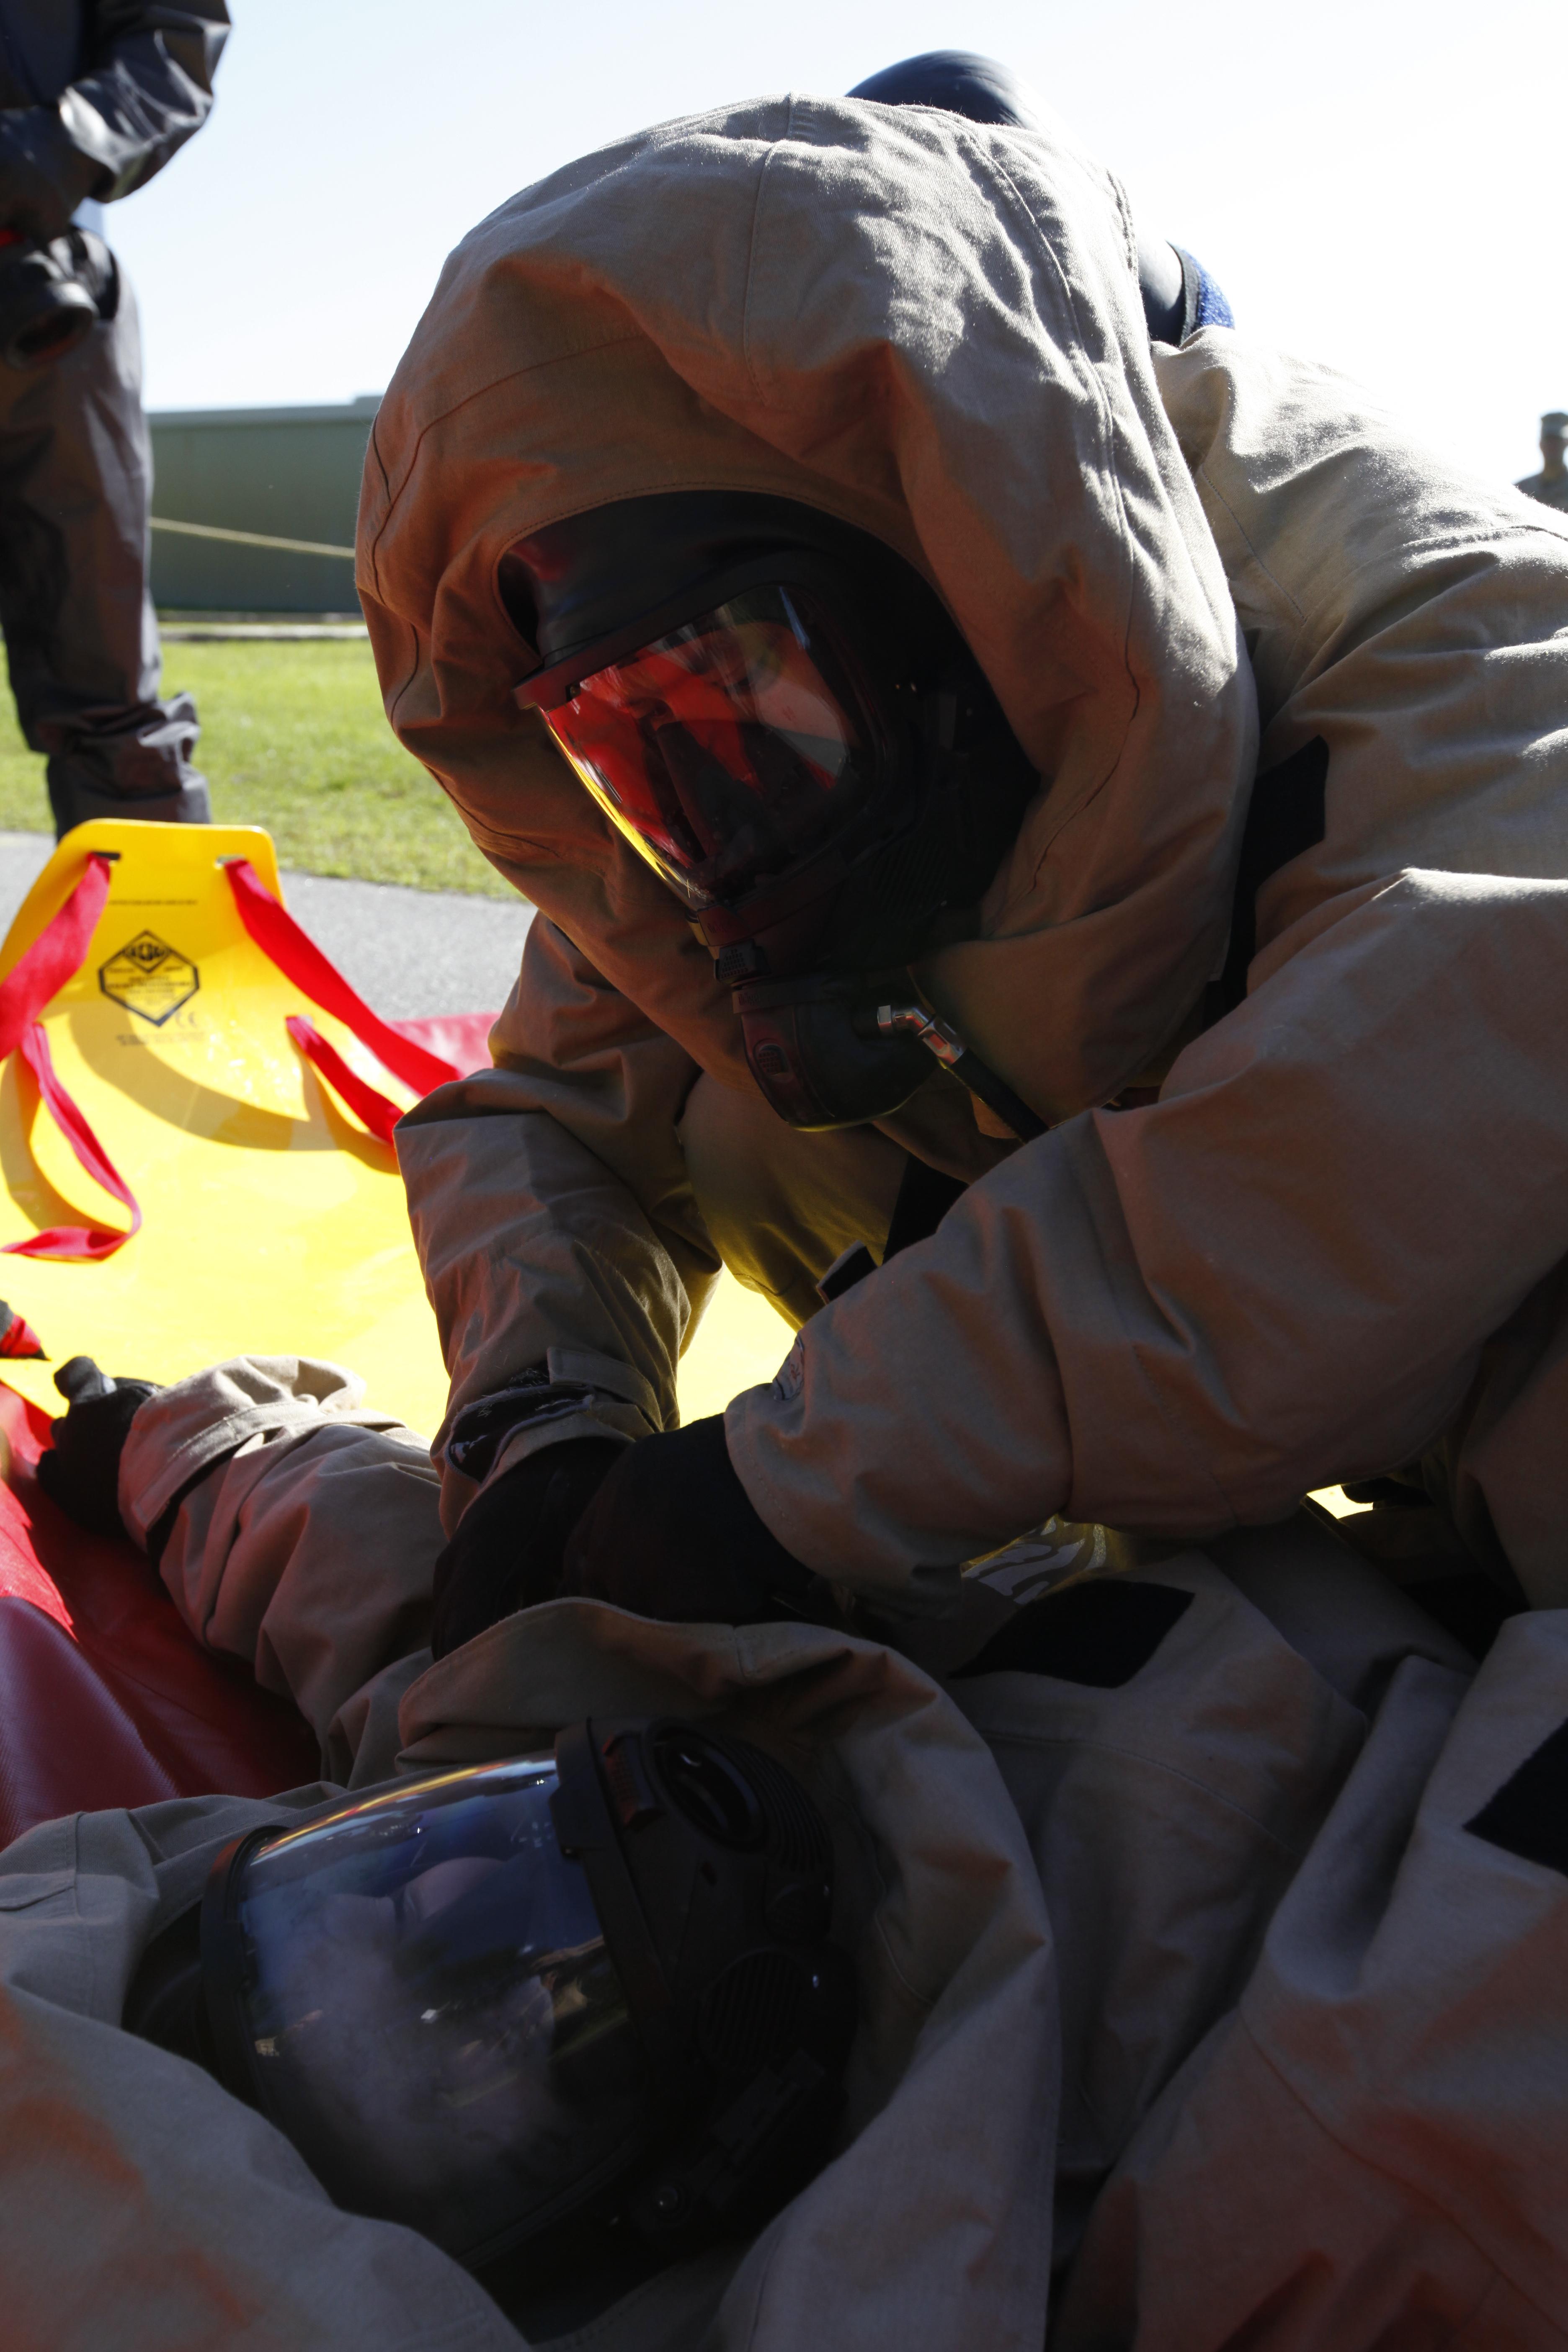 File:CBRN Marines respond to chemical warfare threat 130614-M-FL266